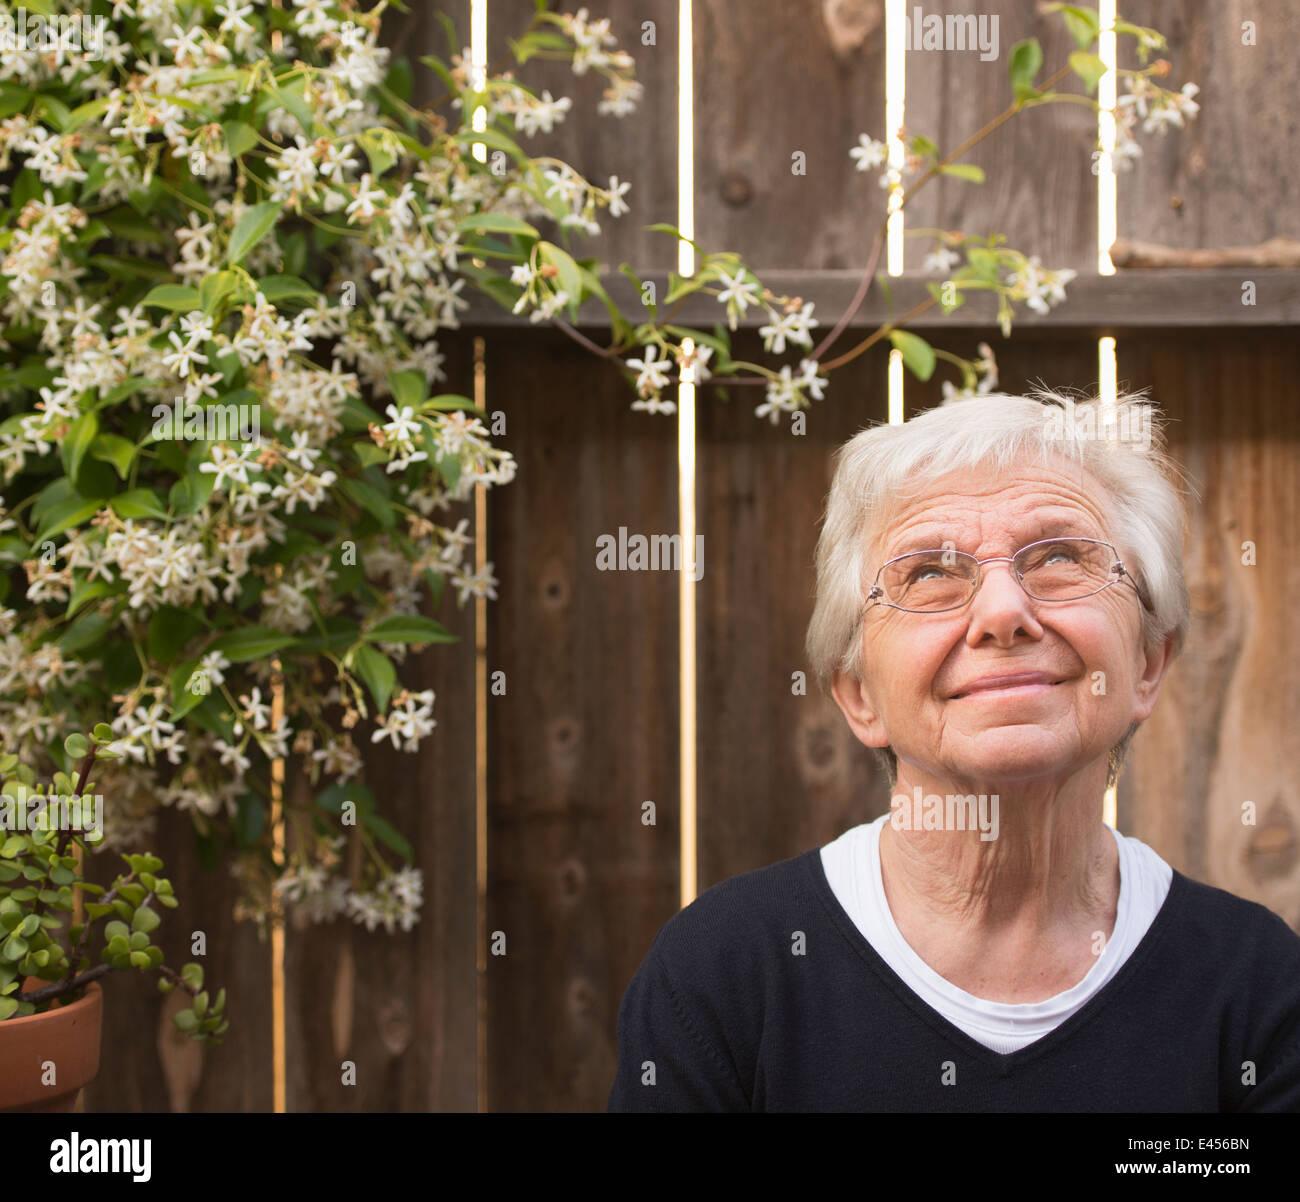 Portrait of smiling senior woman in garden gazing upward - Stock Image